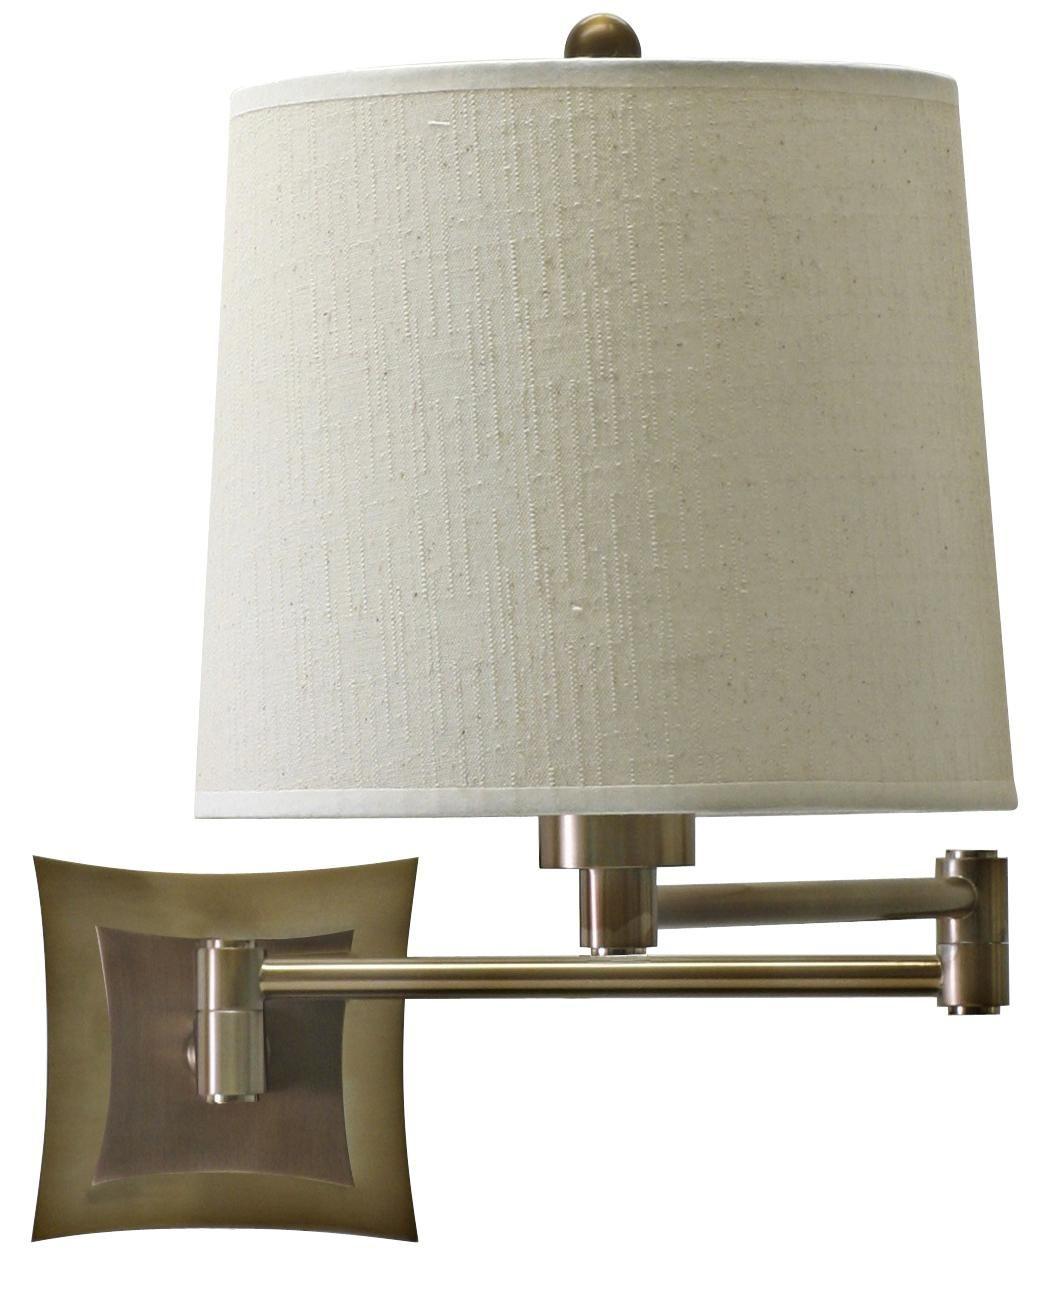 Brass Finish Bi Level Backplate Plug In Swing Arm Wall Lamp House Of Troy Swing Arm Wall Light Swing Arm Wall Lamps